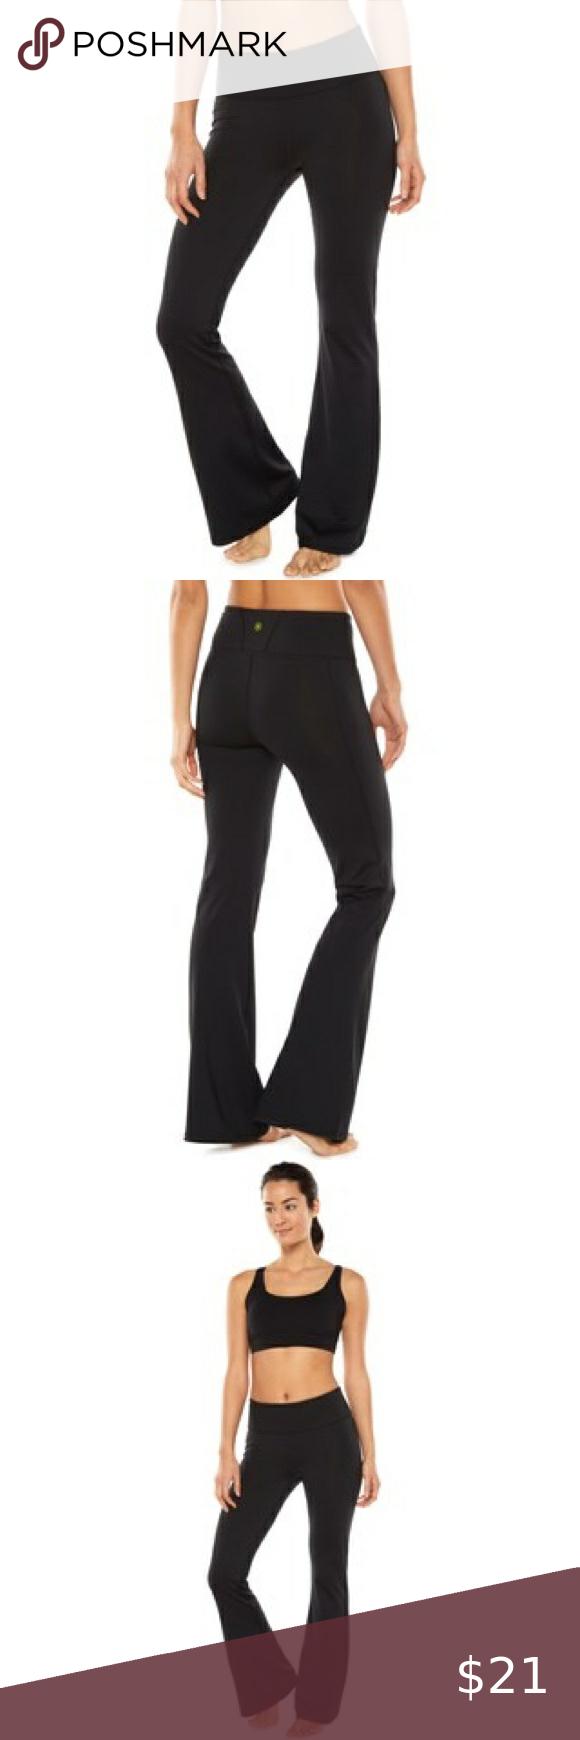 Women's Gaiam Zen Bootcut Yoga Pants in